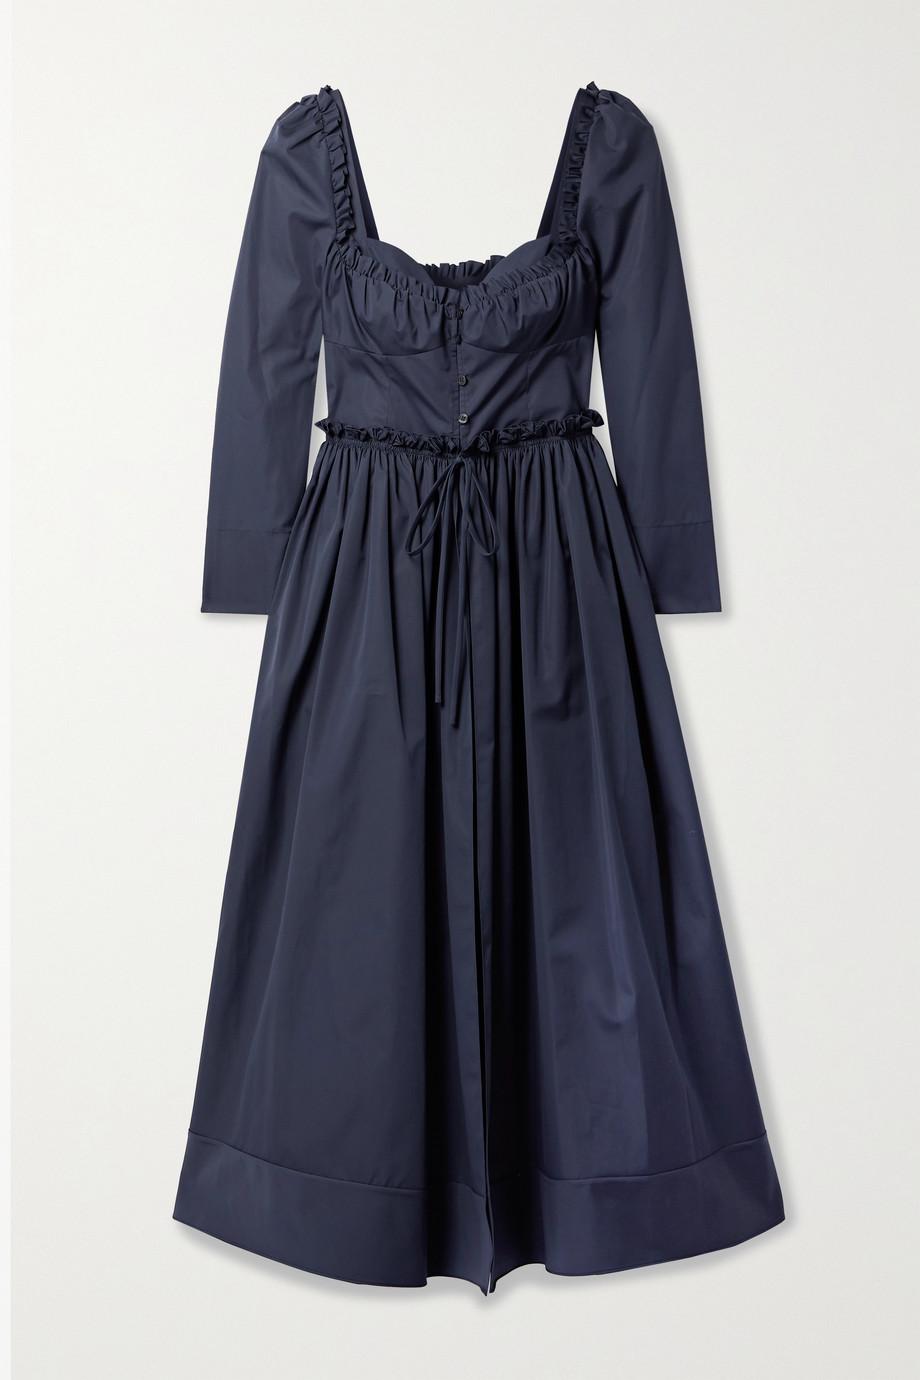 Rosie Assoulin Winter Garden Party layered ruffled cotton-poplin midi dress